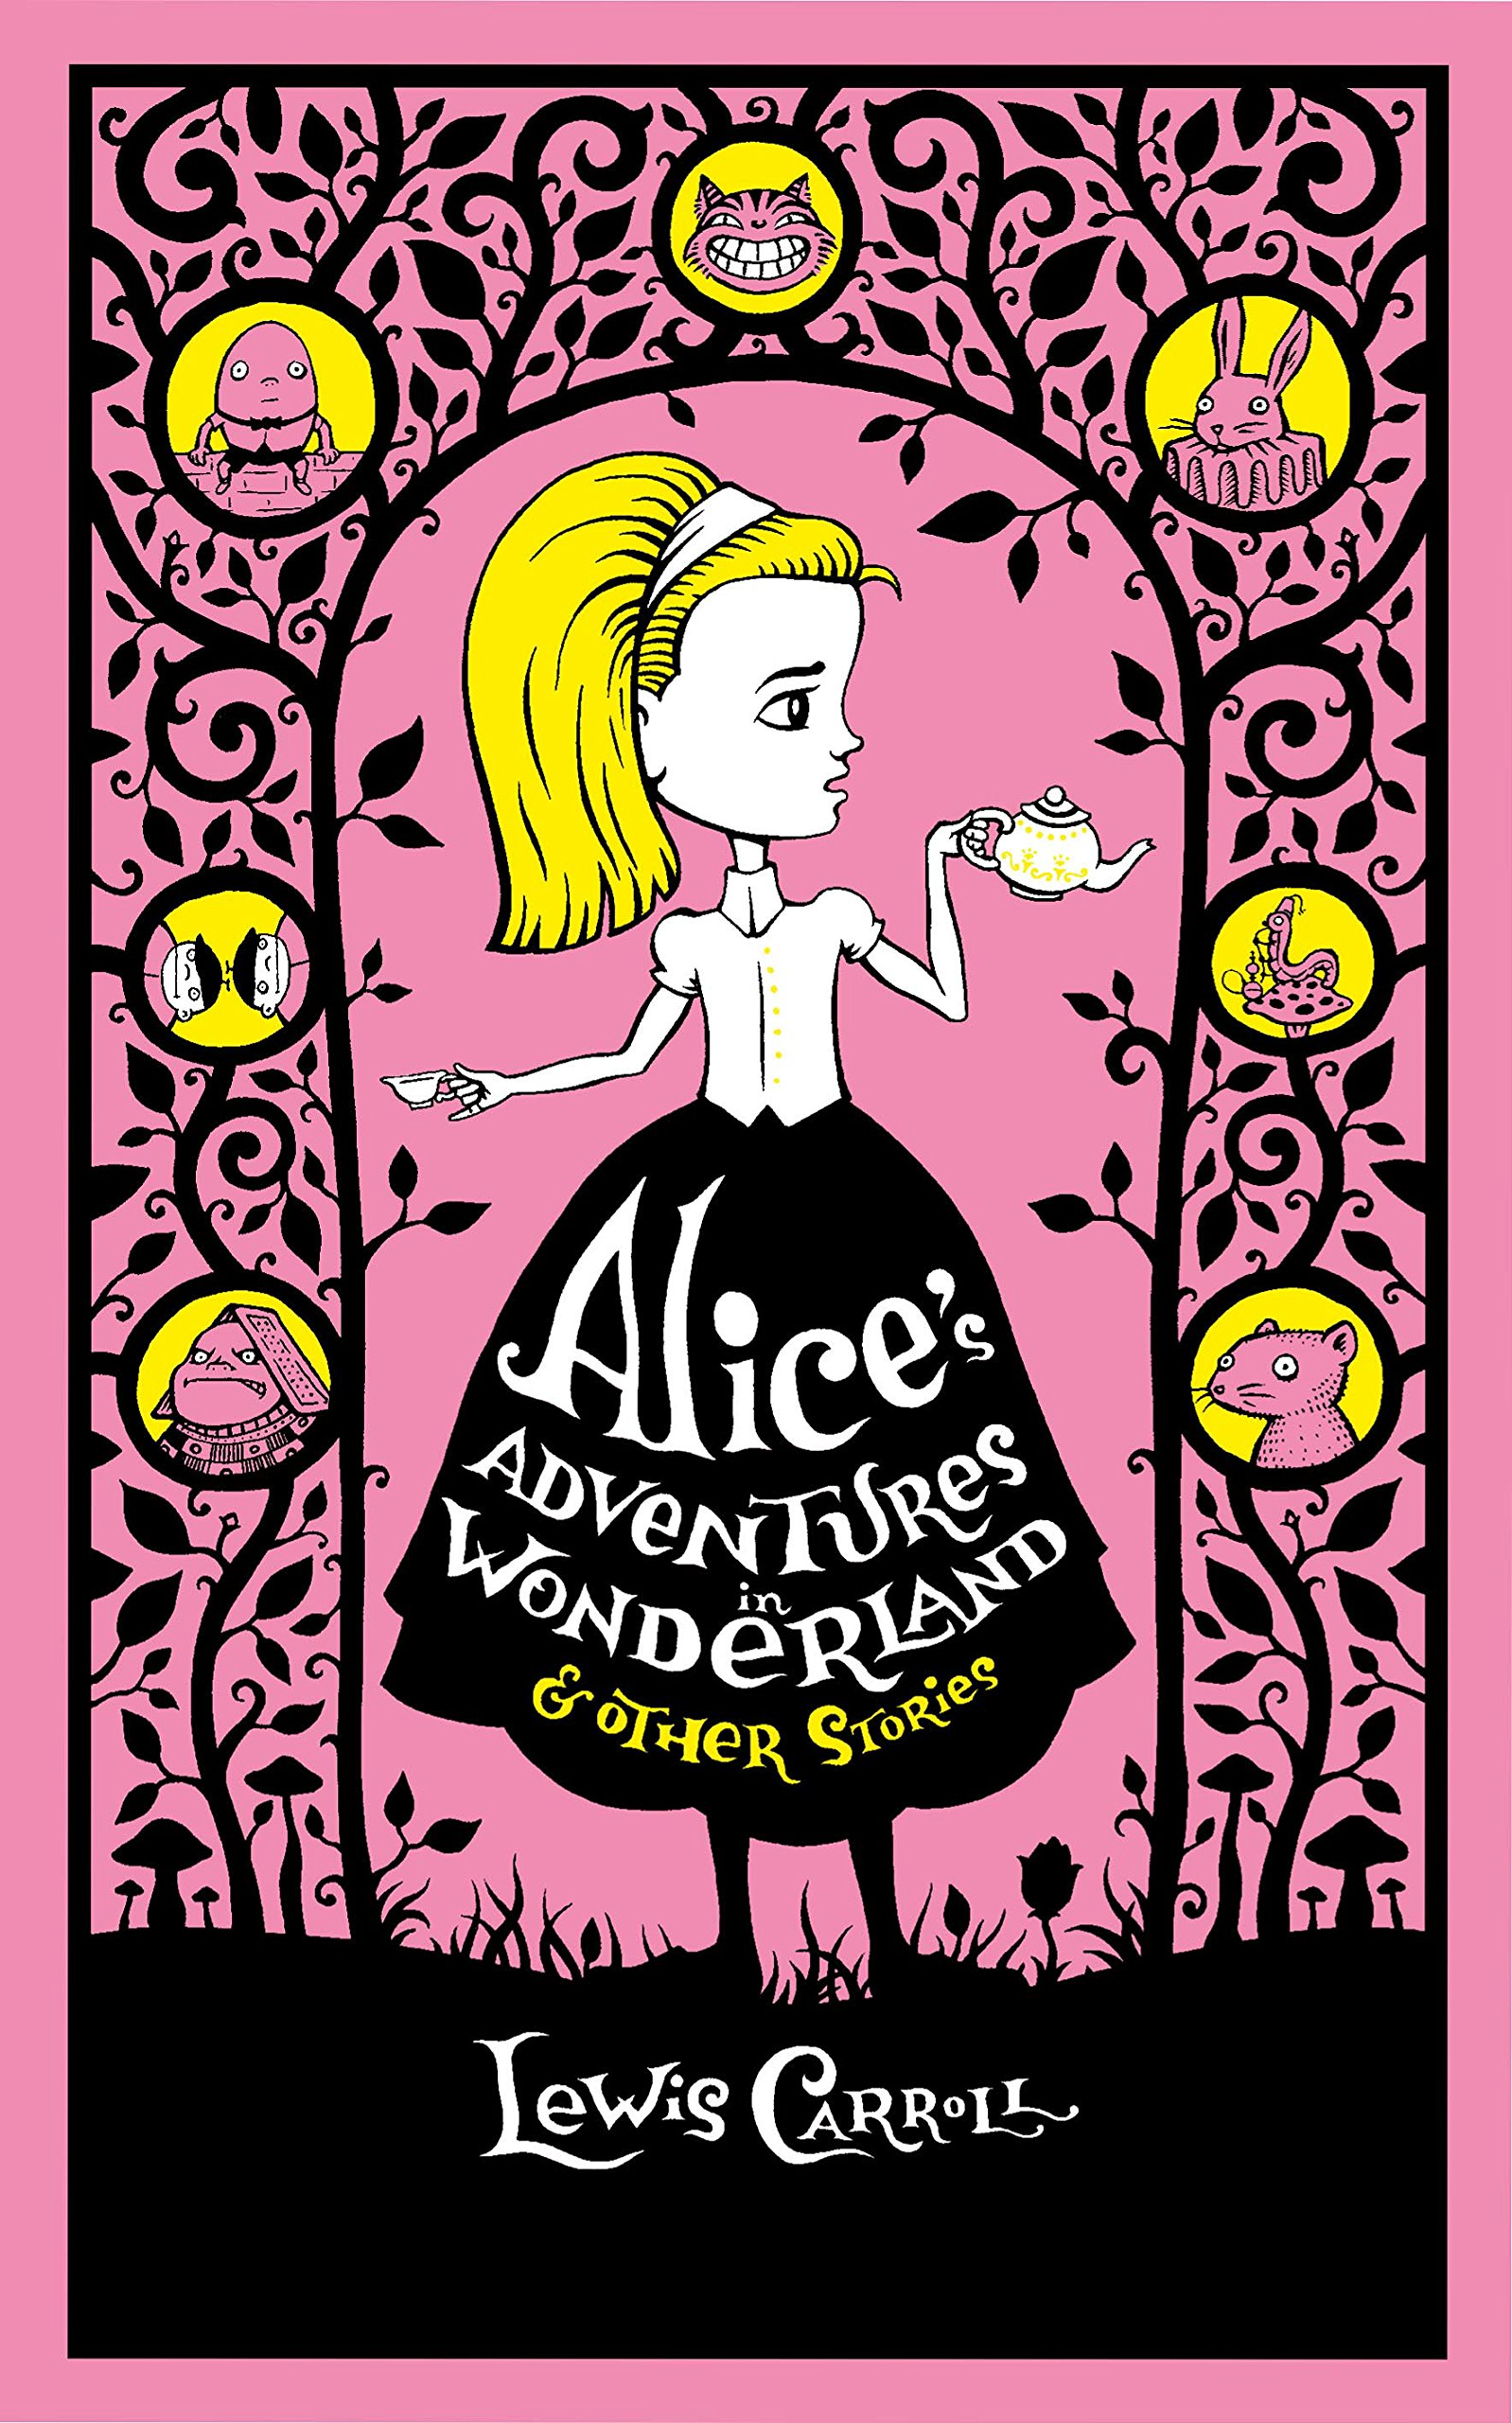 Alice's Adventures in Wonderland & Other Stories (Barnes & Noble Collectible Classics: Omnibus Edition) (Barnes & Noble Leatherbound Classic Collection)